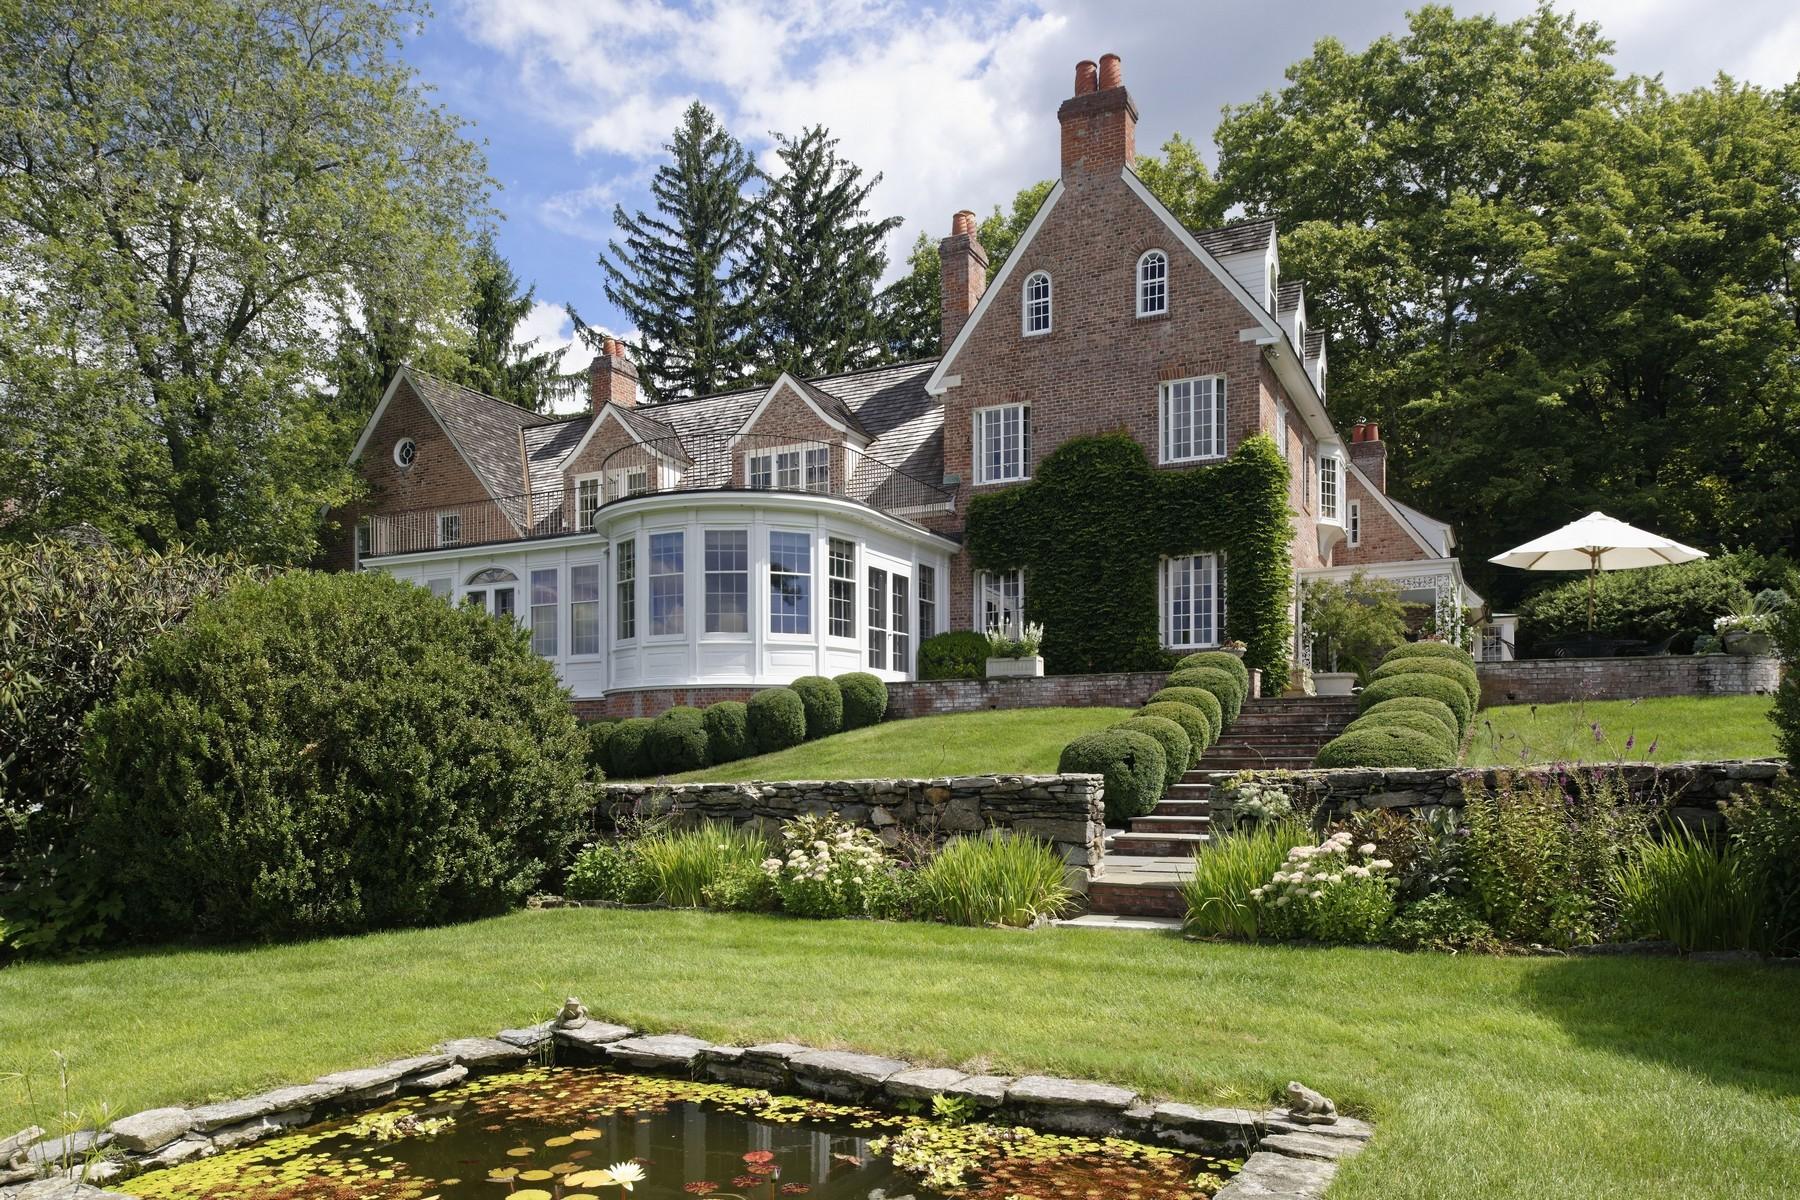 Casa Unifamiliar por un Venta en SASCO MANOR WITH PANORAMIC WATER VIEWS 828 Sasco Hill Road Fairfield, Connecticut 06824 Estados Unidos